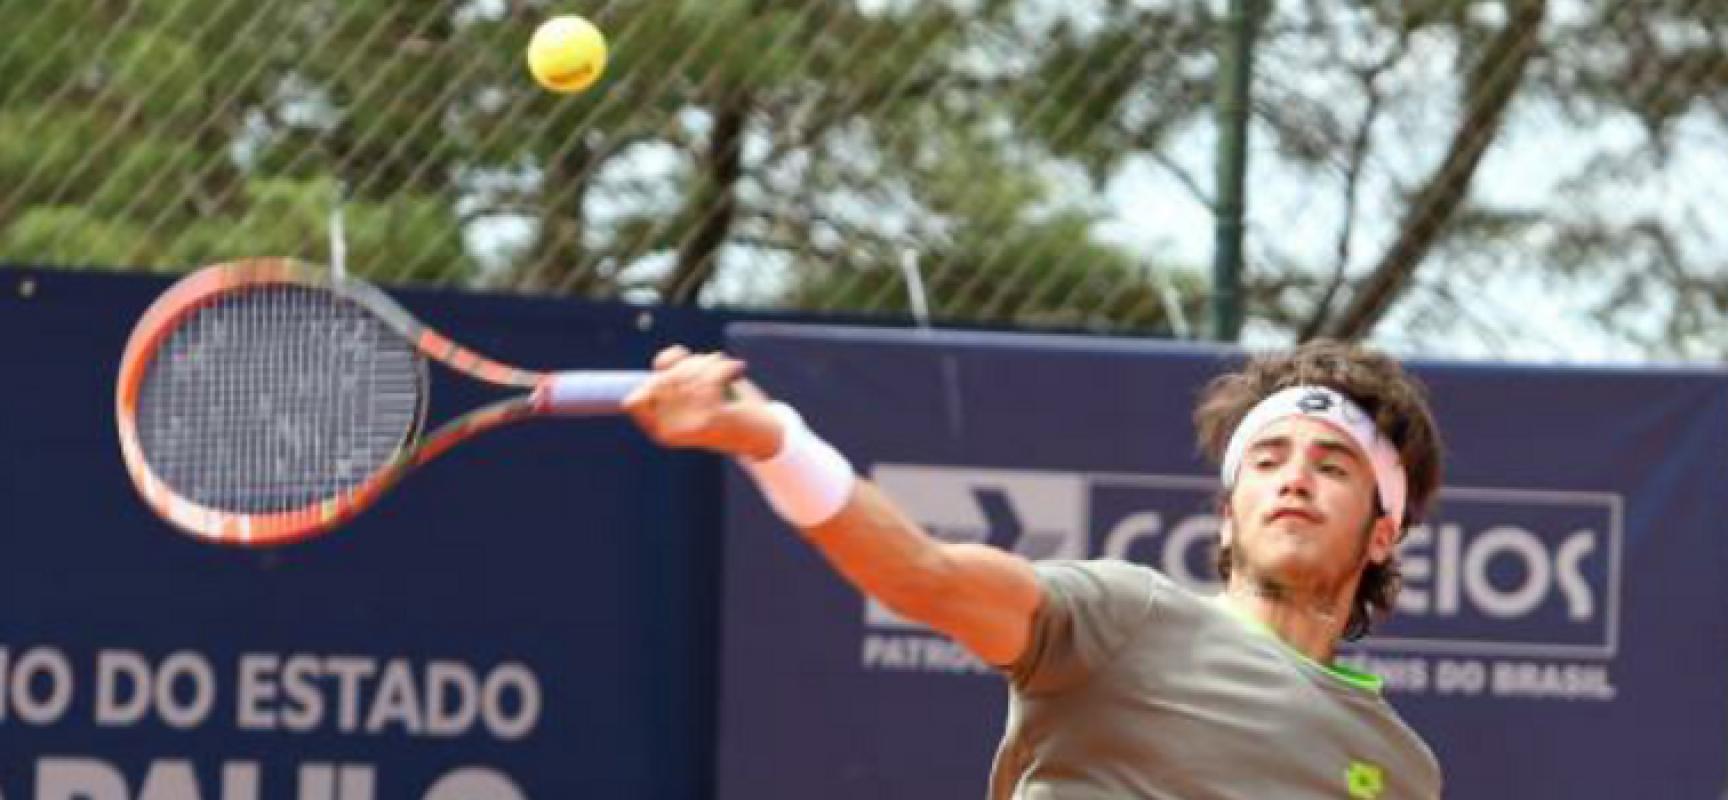 Tennis, Pellegrino eliminato al primo turno degli Australian Open